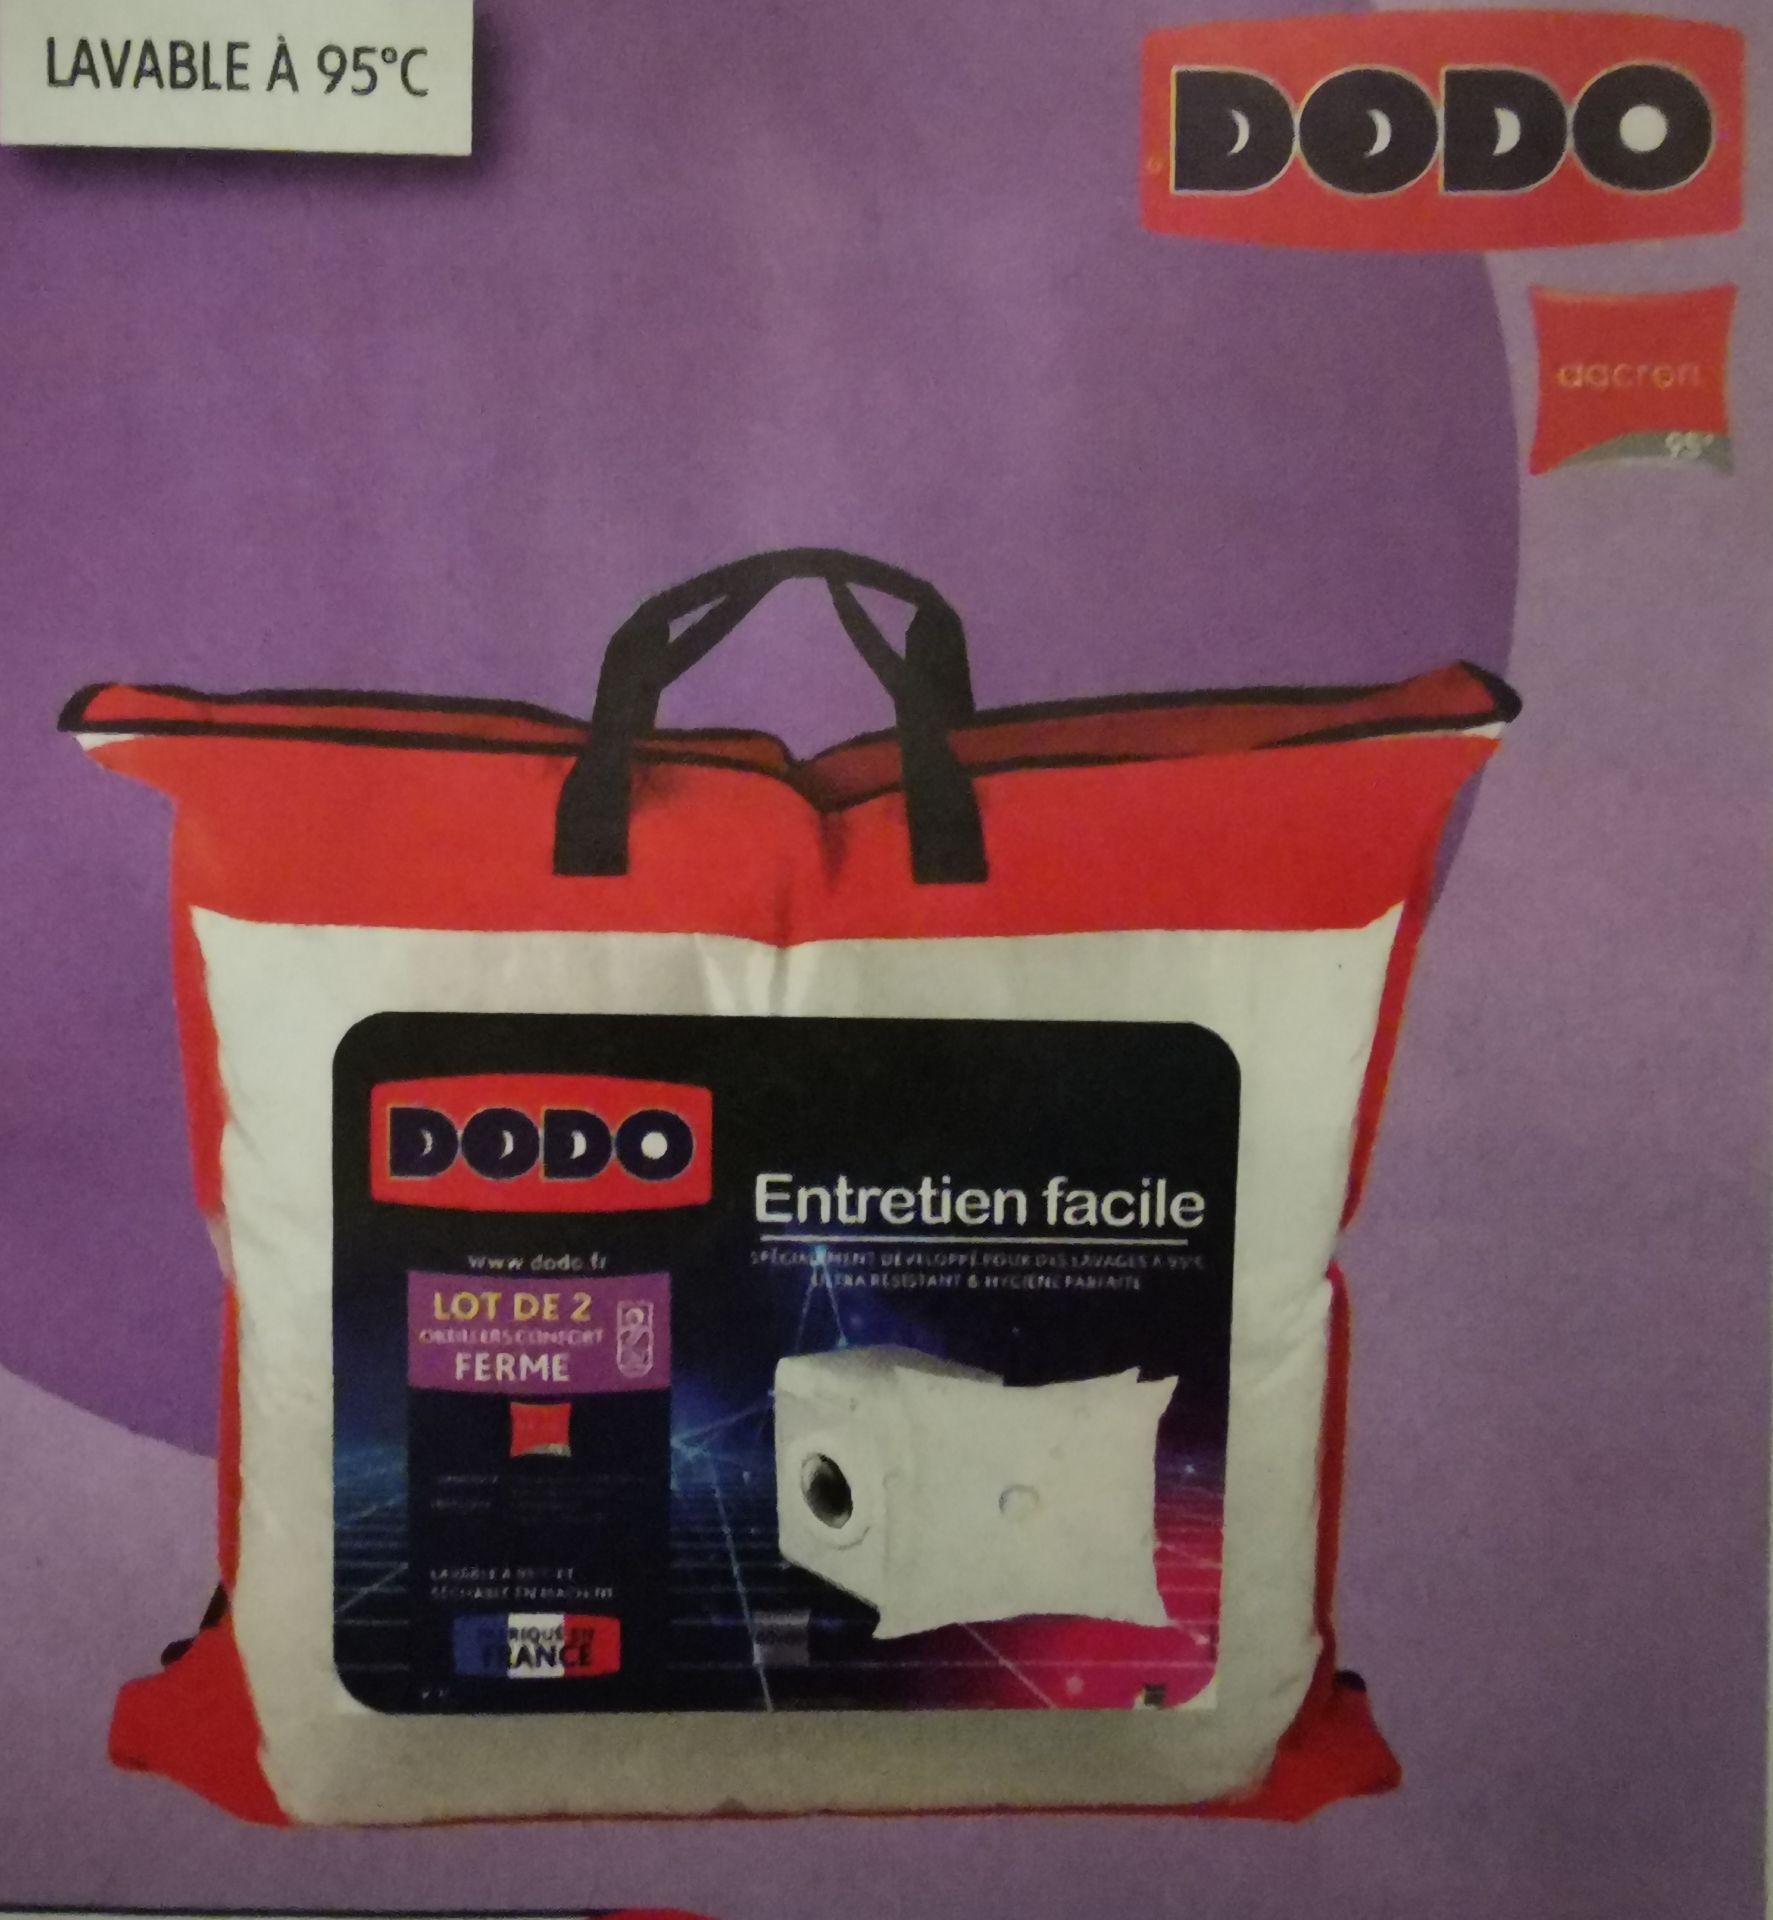 Lot de 2 oreillers fermes Dodo - 60 x 60cm